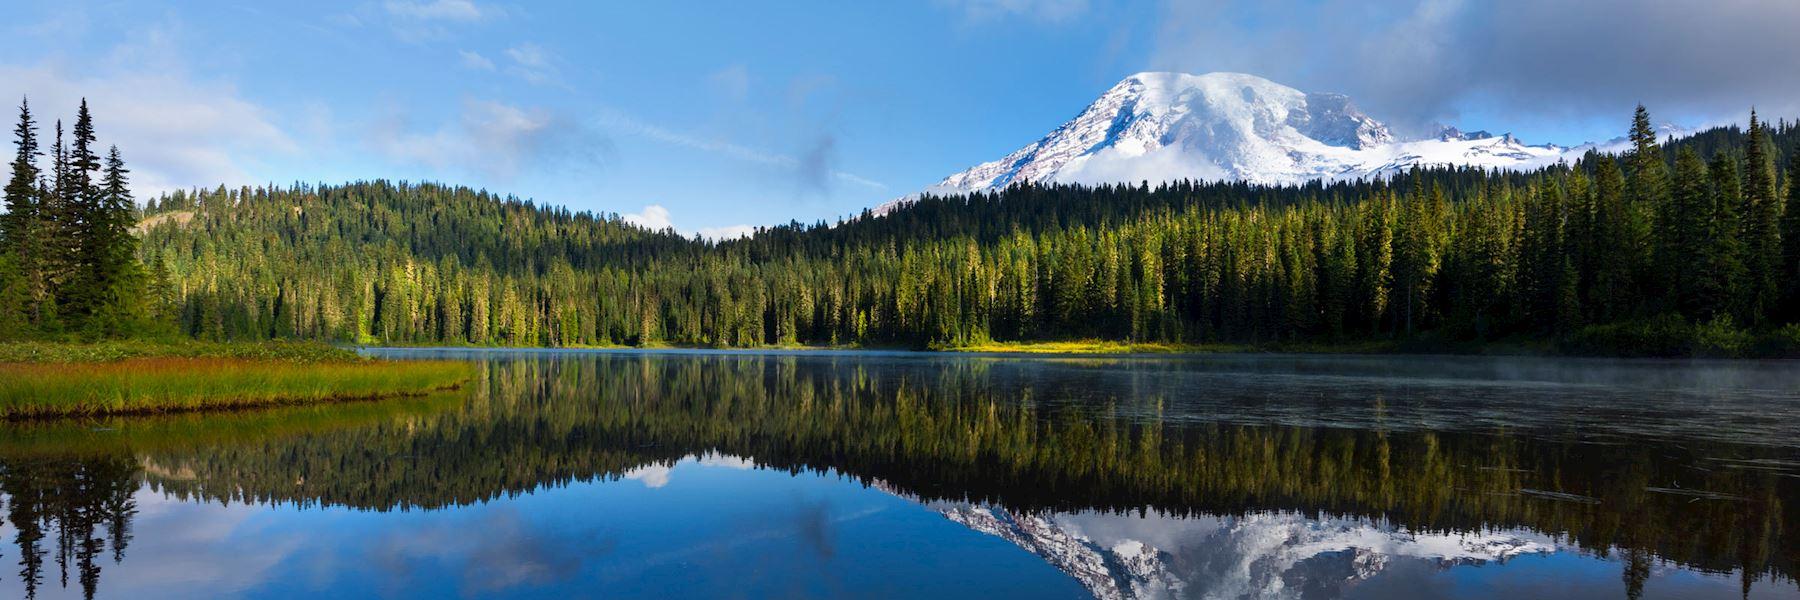 Visit Mount Rainier National Park, USA